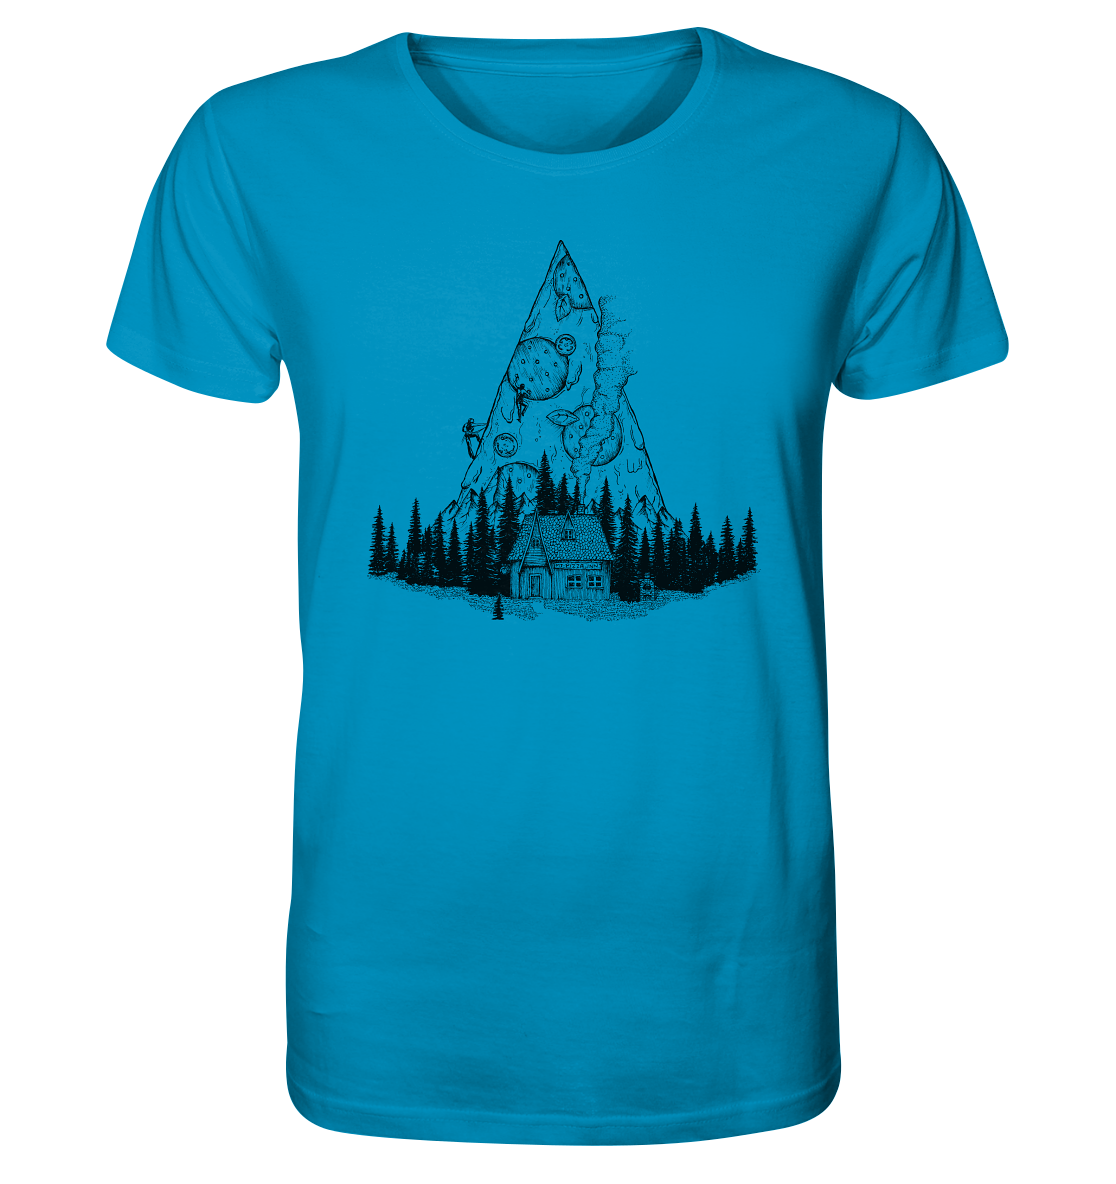 front-organic-shirt-0092c0-1116x.png